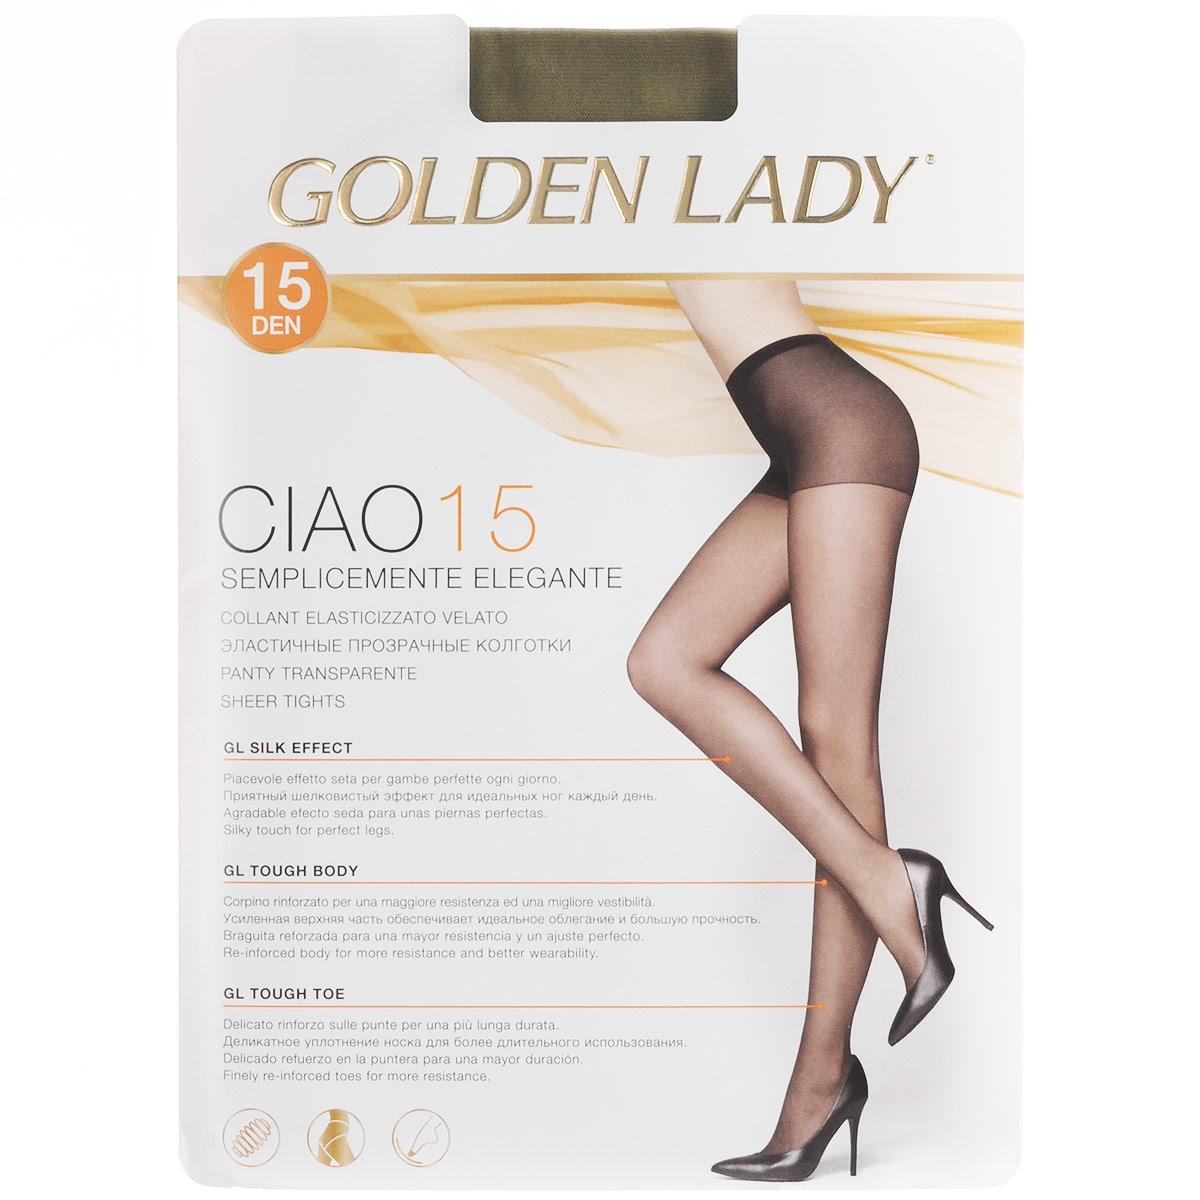 Колготки женские Golden Lady Ciao 15, цвет: Daino (бледно-коричневый). 36N-UR. Размер 4 (L) цены онлайн